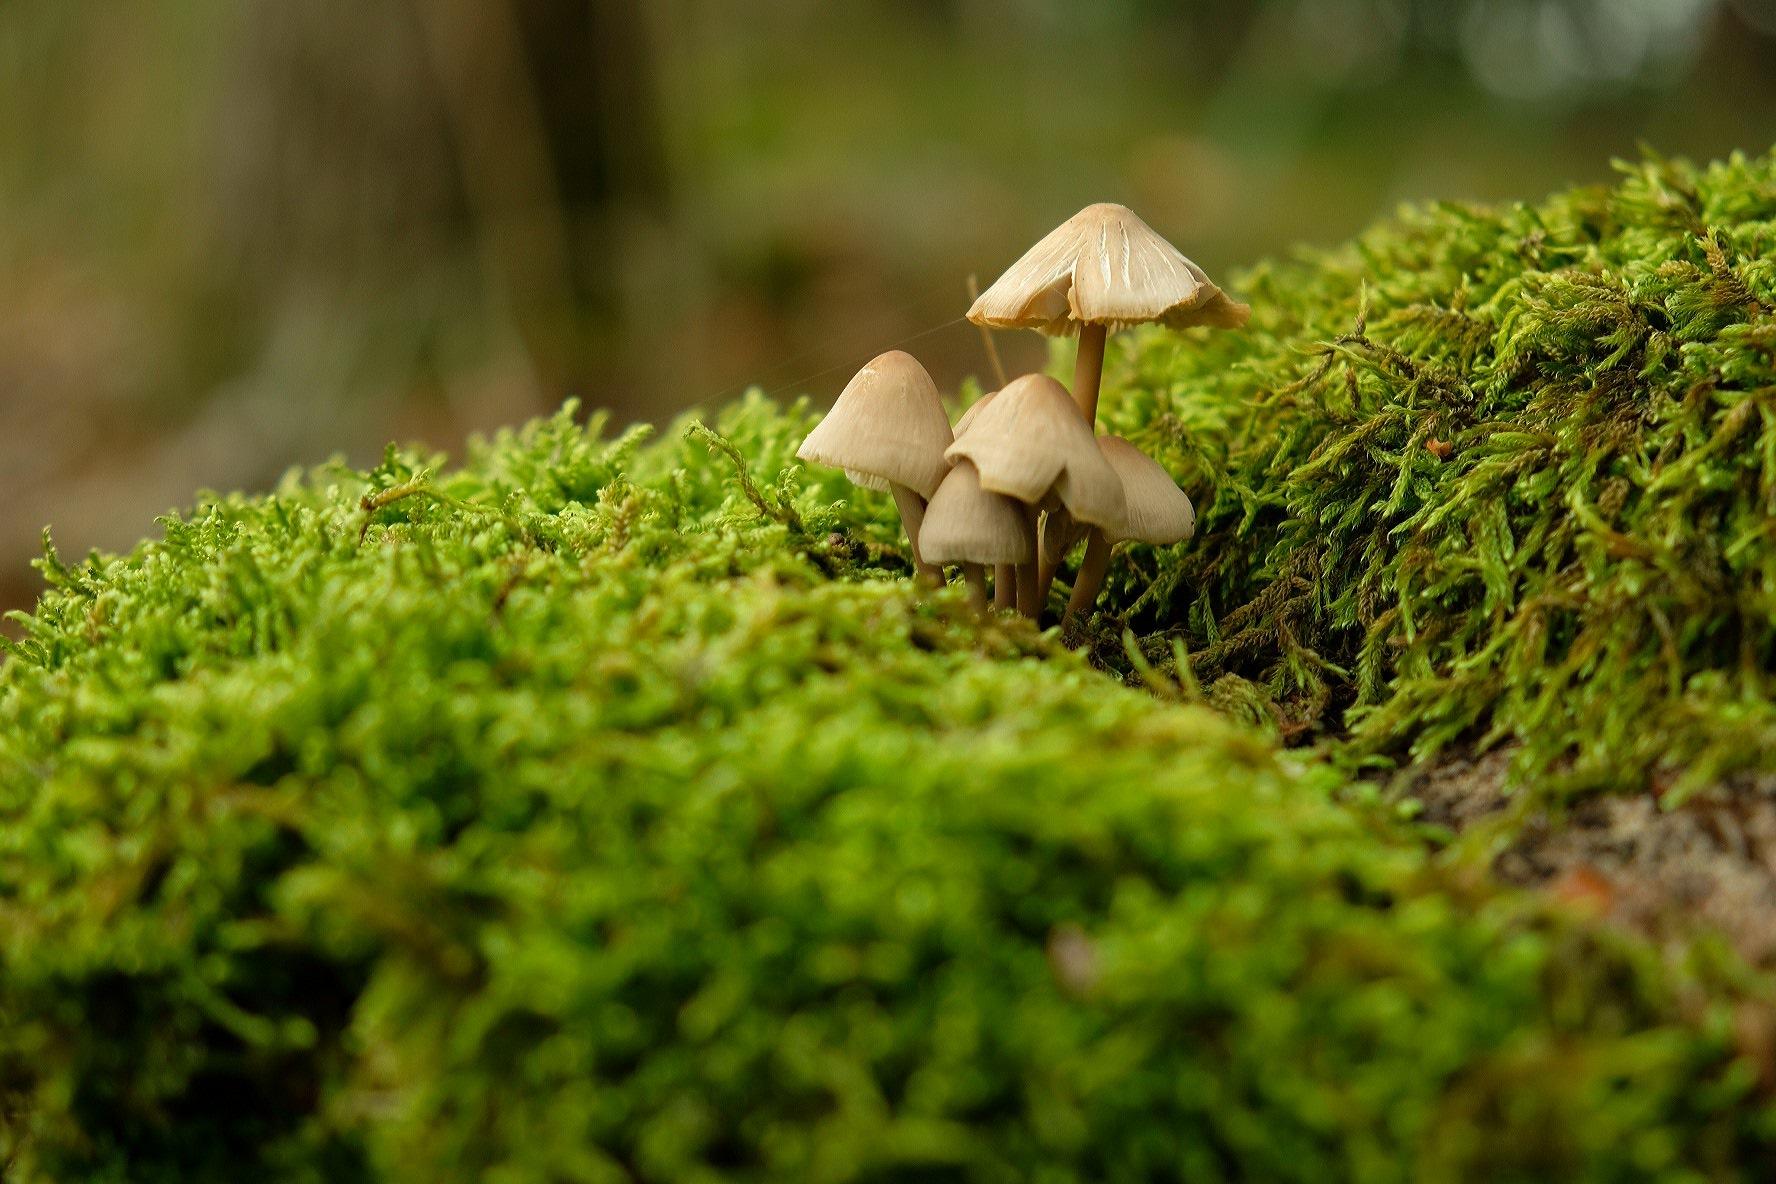 Fungus by StudioAnjaPhotography